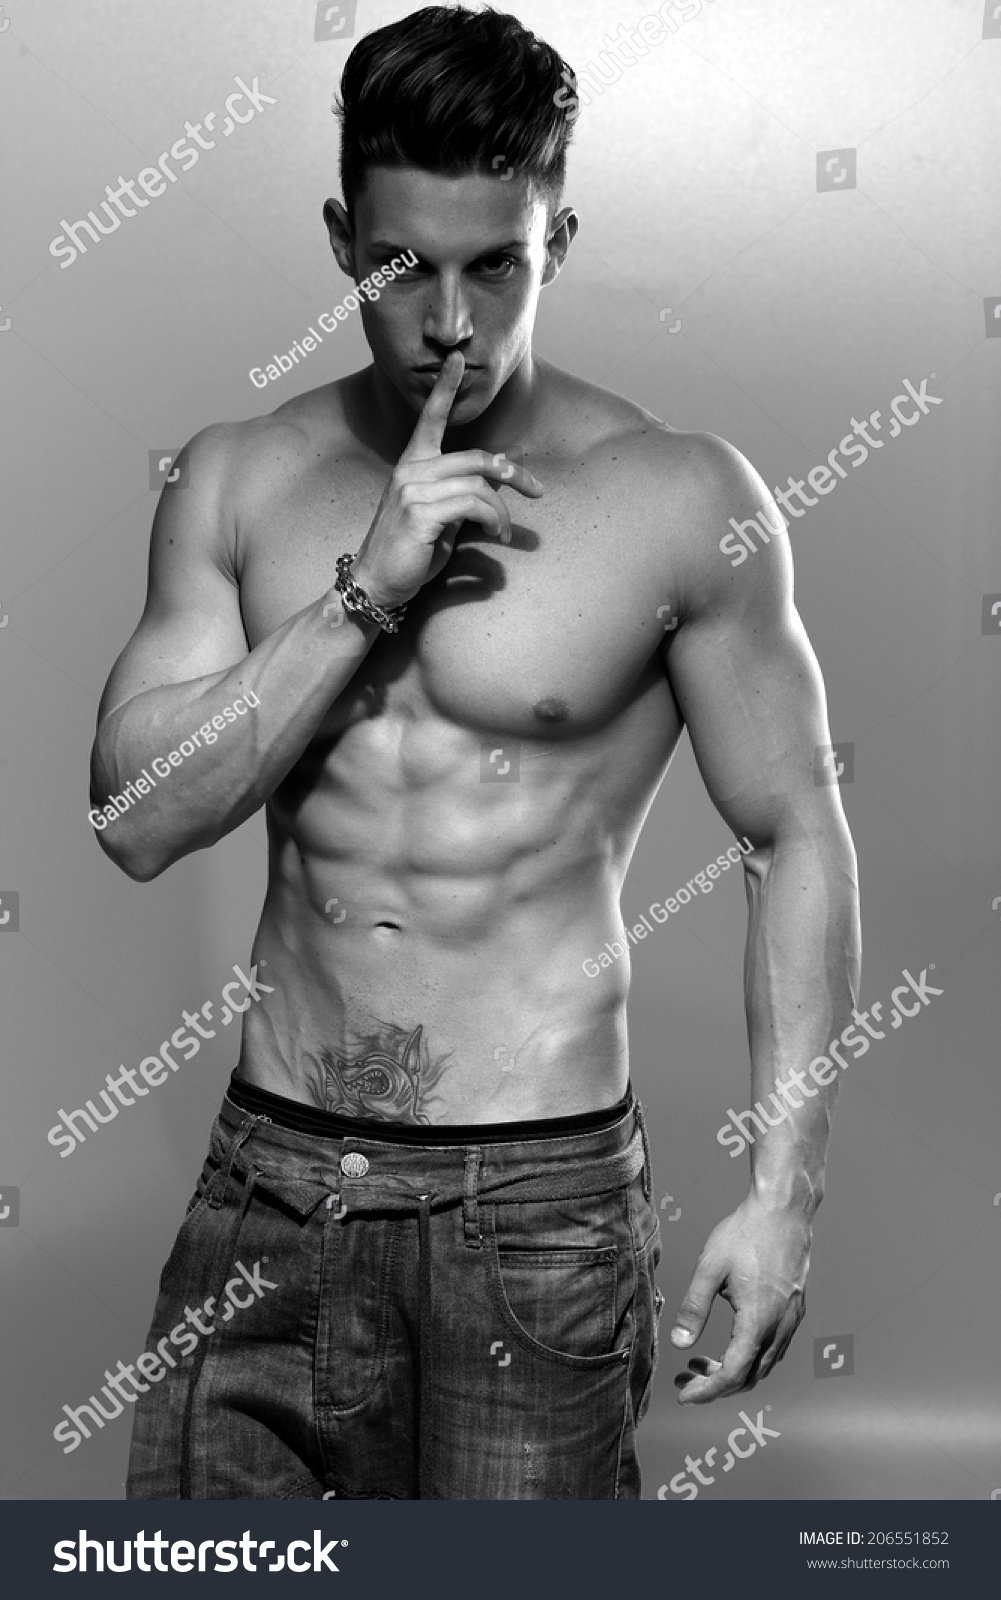 Body hot photo male Ryan Gosling,